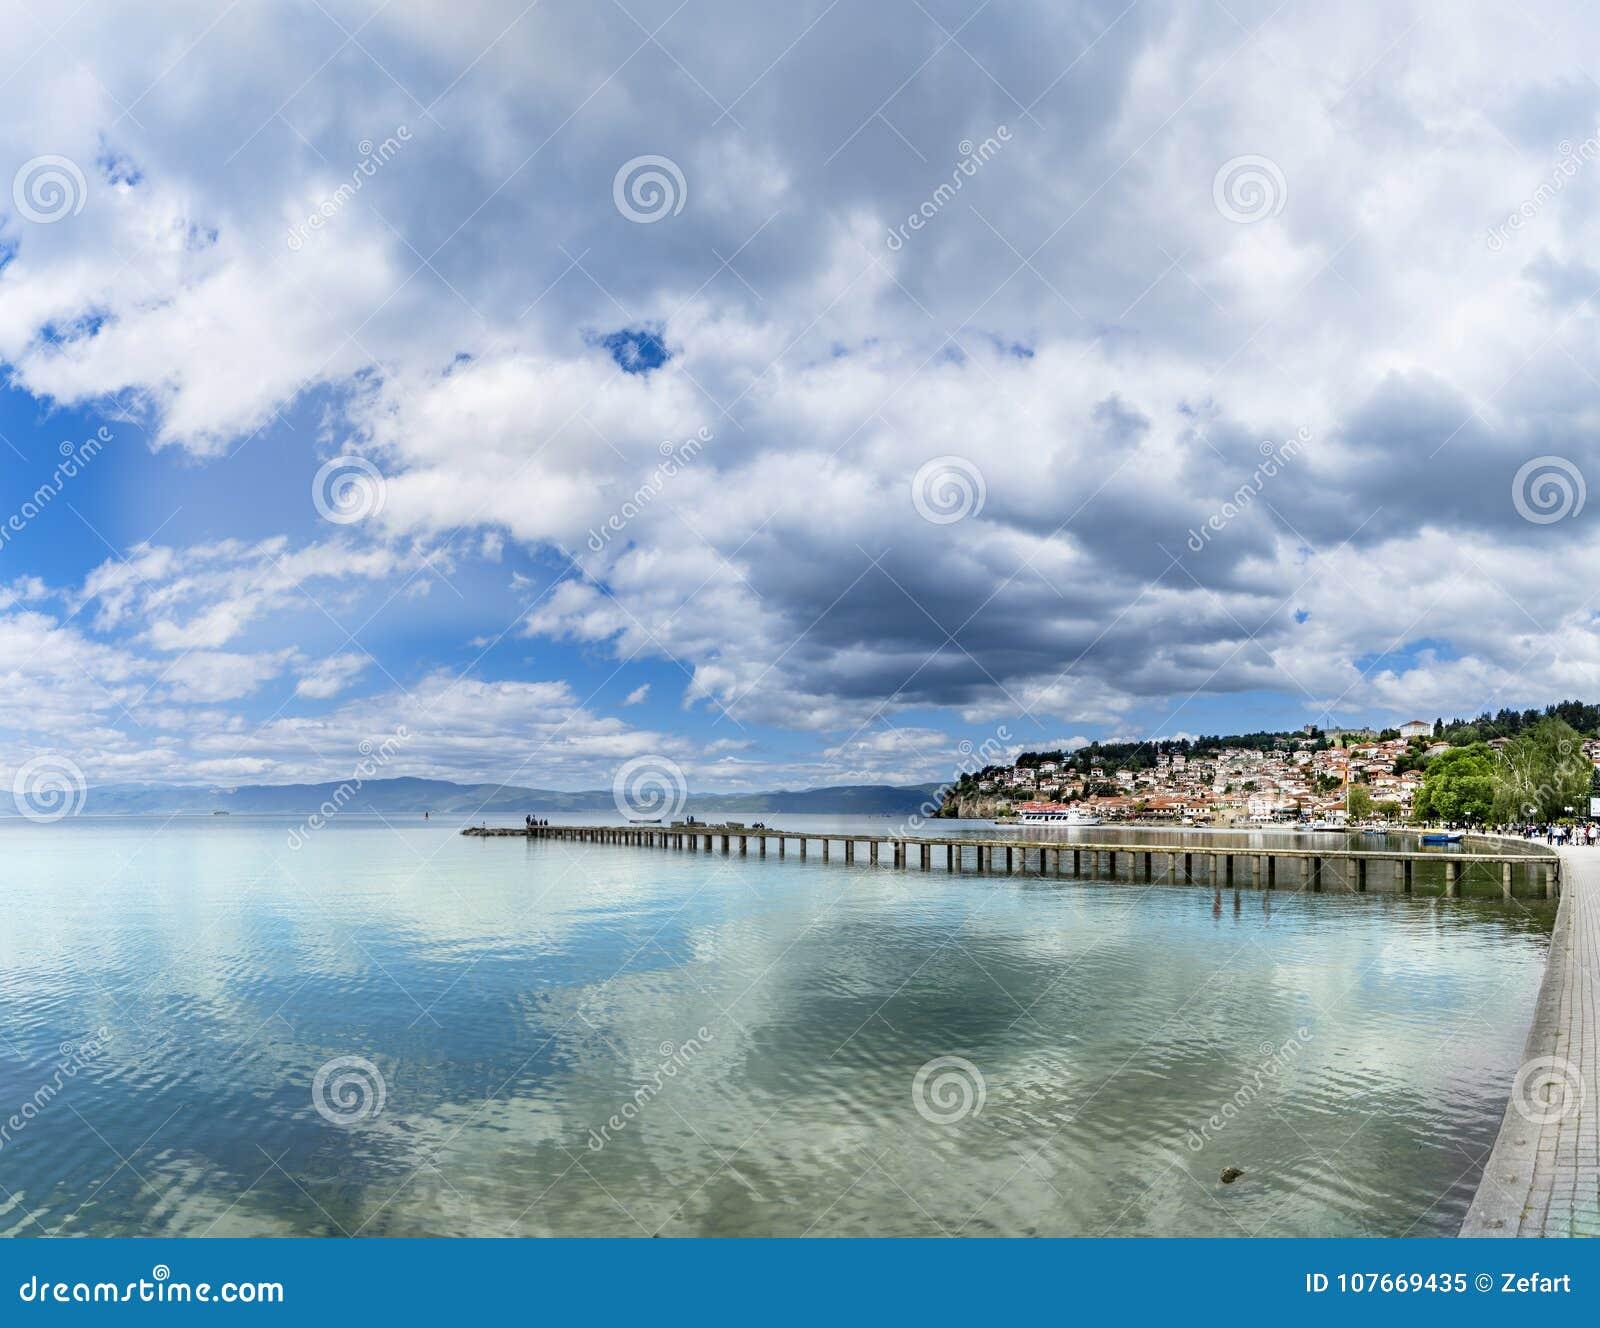 Panoramic view of Ohrid lake